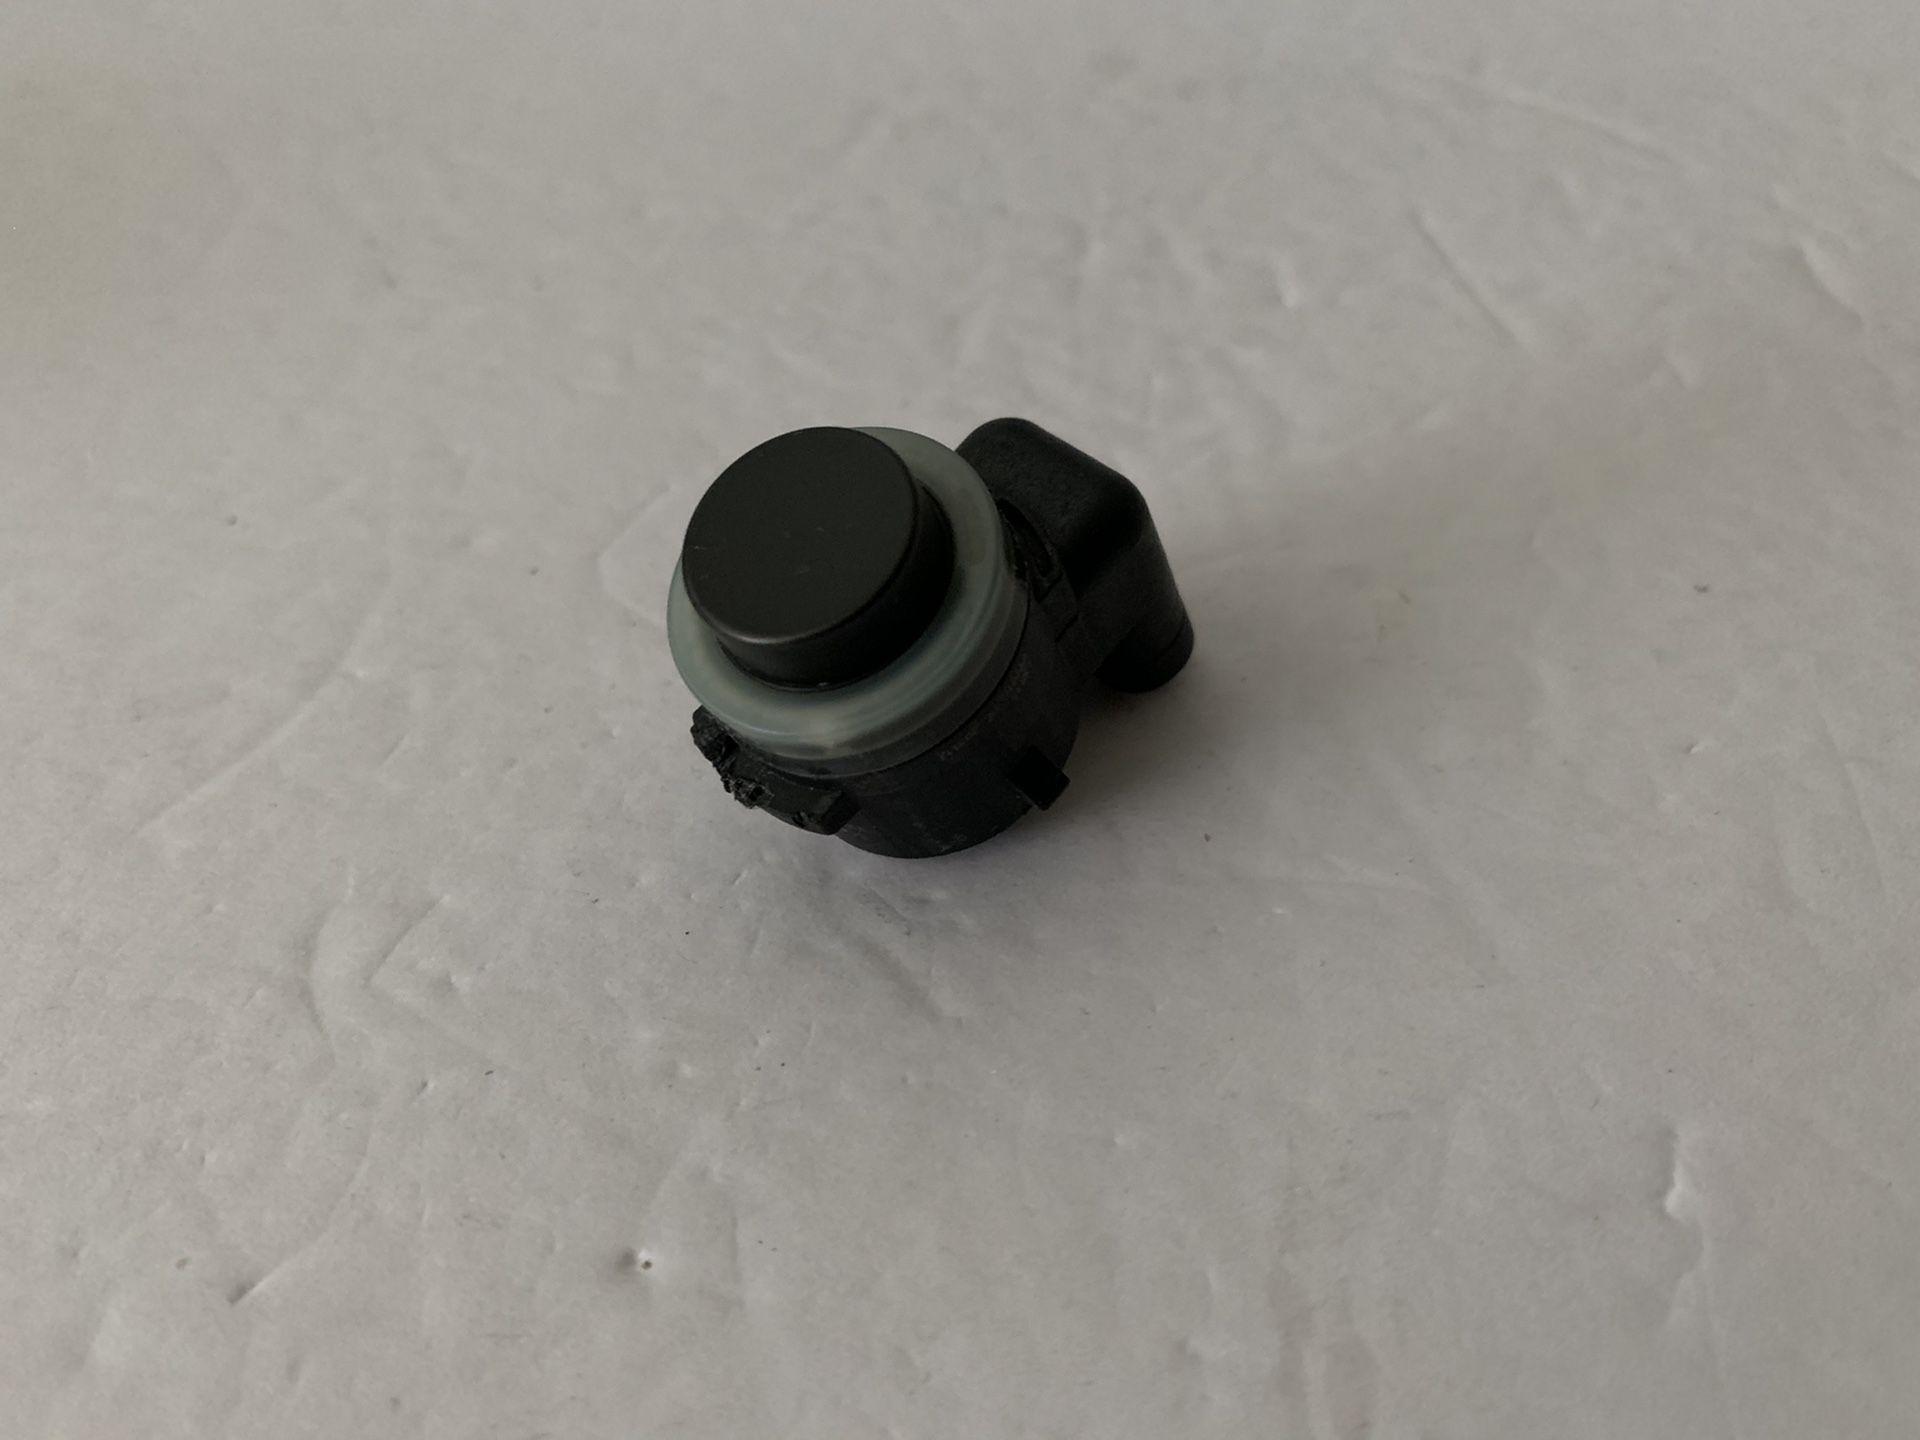 2017-2020 Porsche Panamera Parking Sensor Black